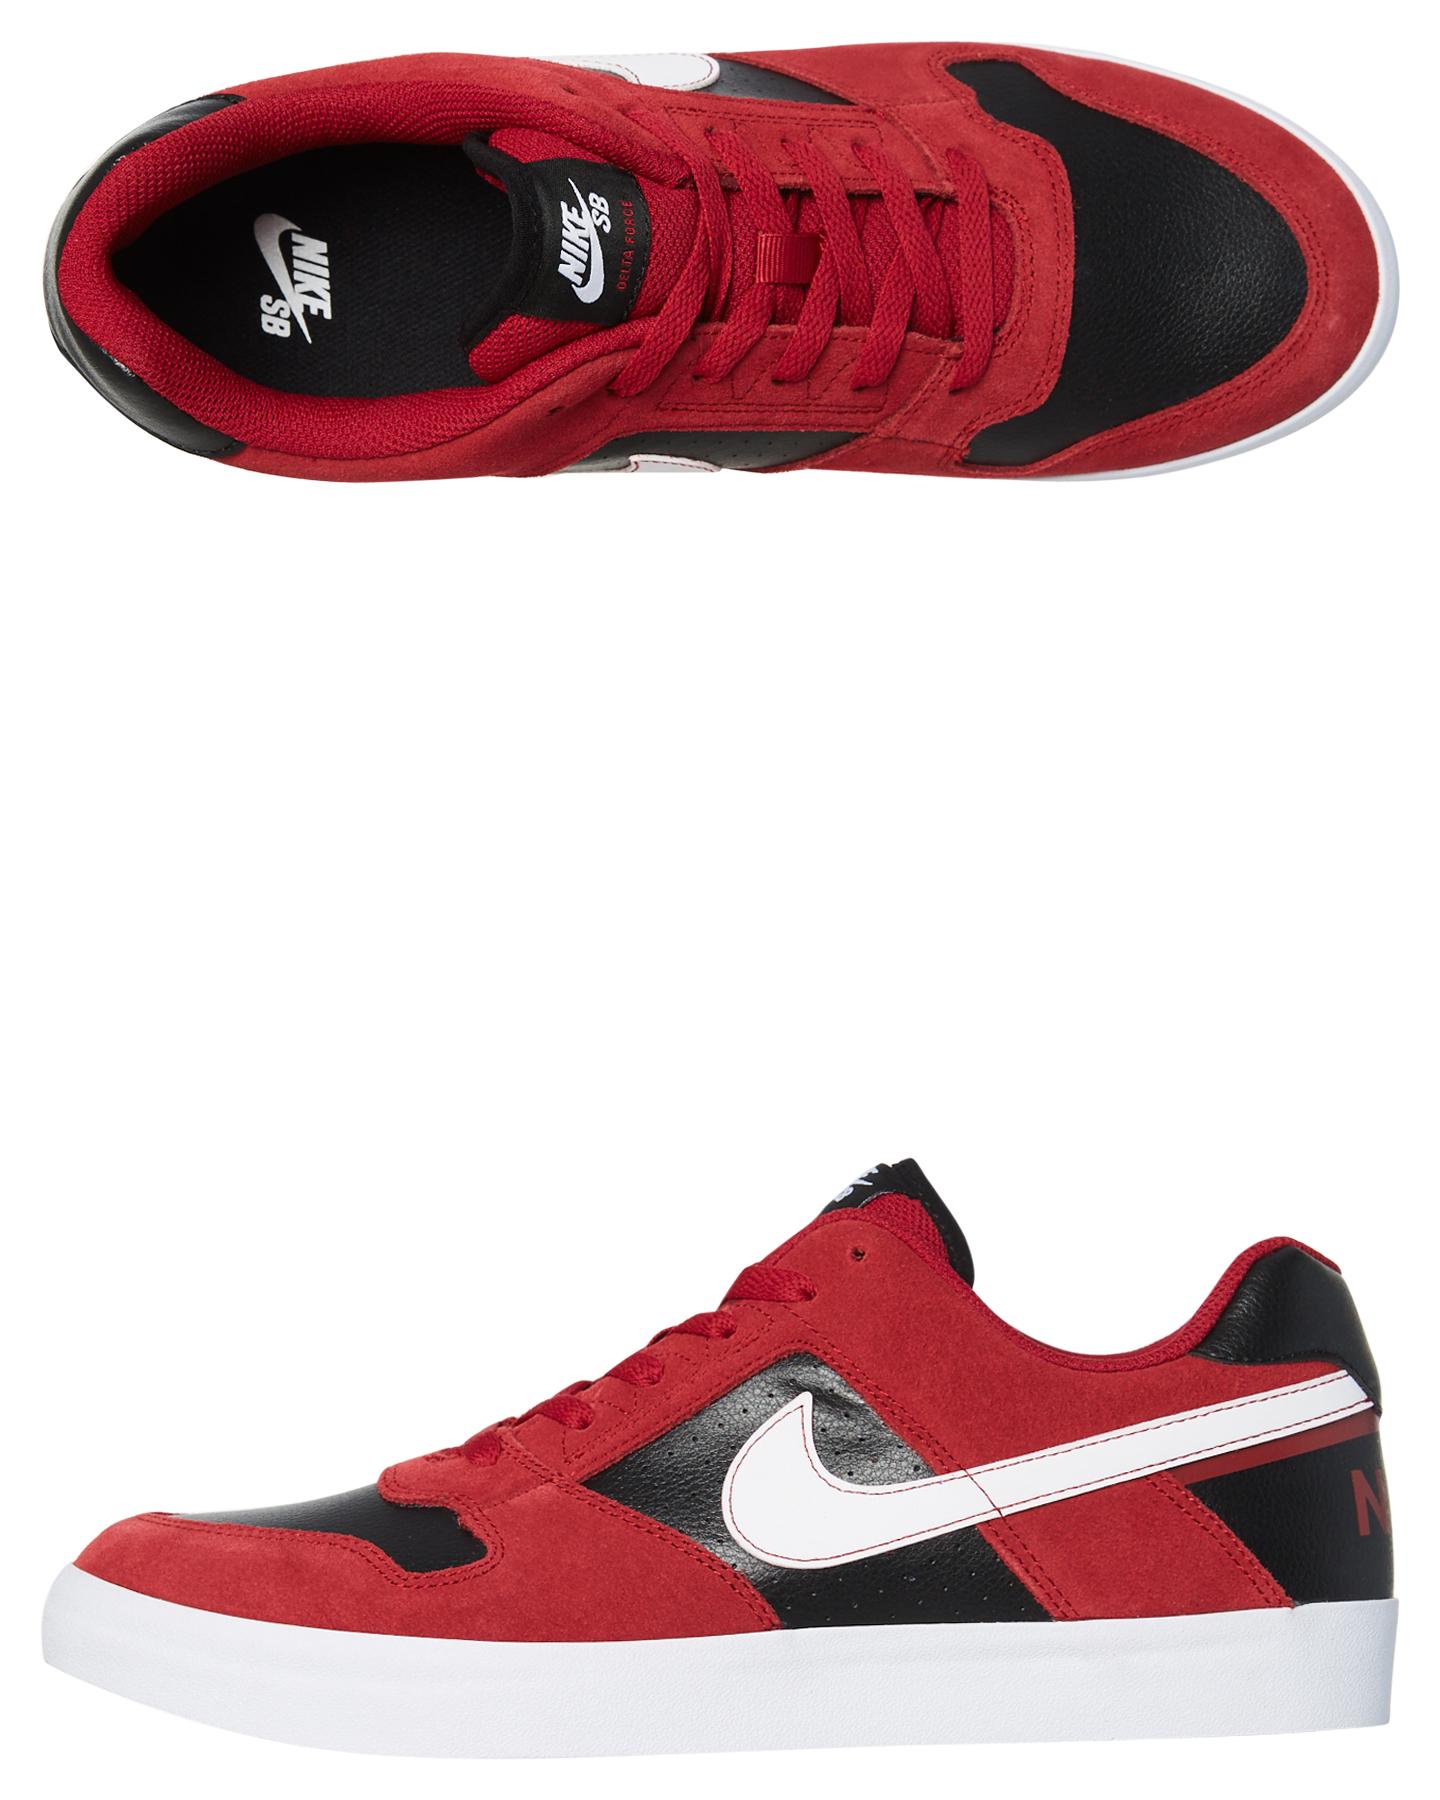 Nike Sb Delta Force Vulc Shoe Red Crush Shoes Size 8   Budget ...